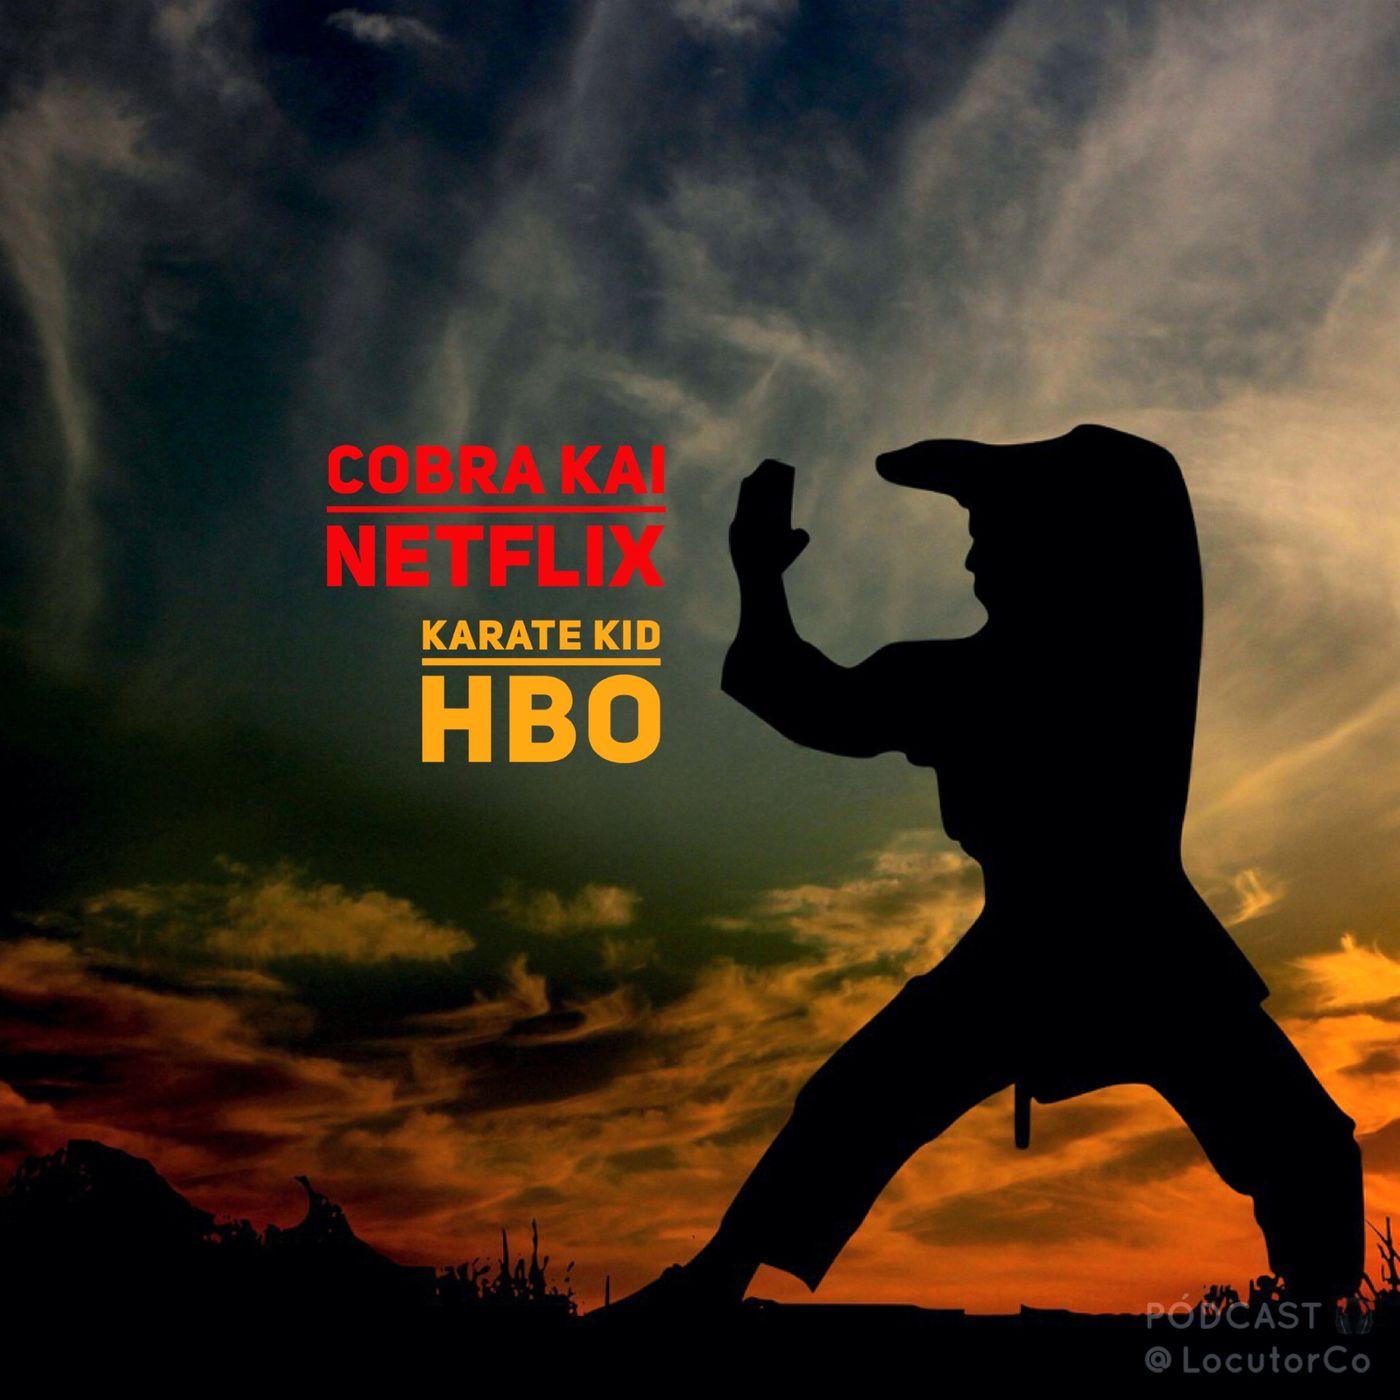 Cobra Kai en Netflix y Karate Kid en HBOGO